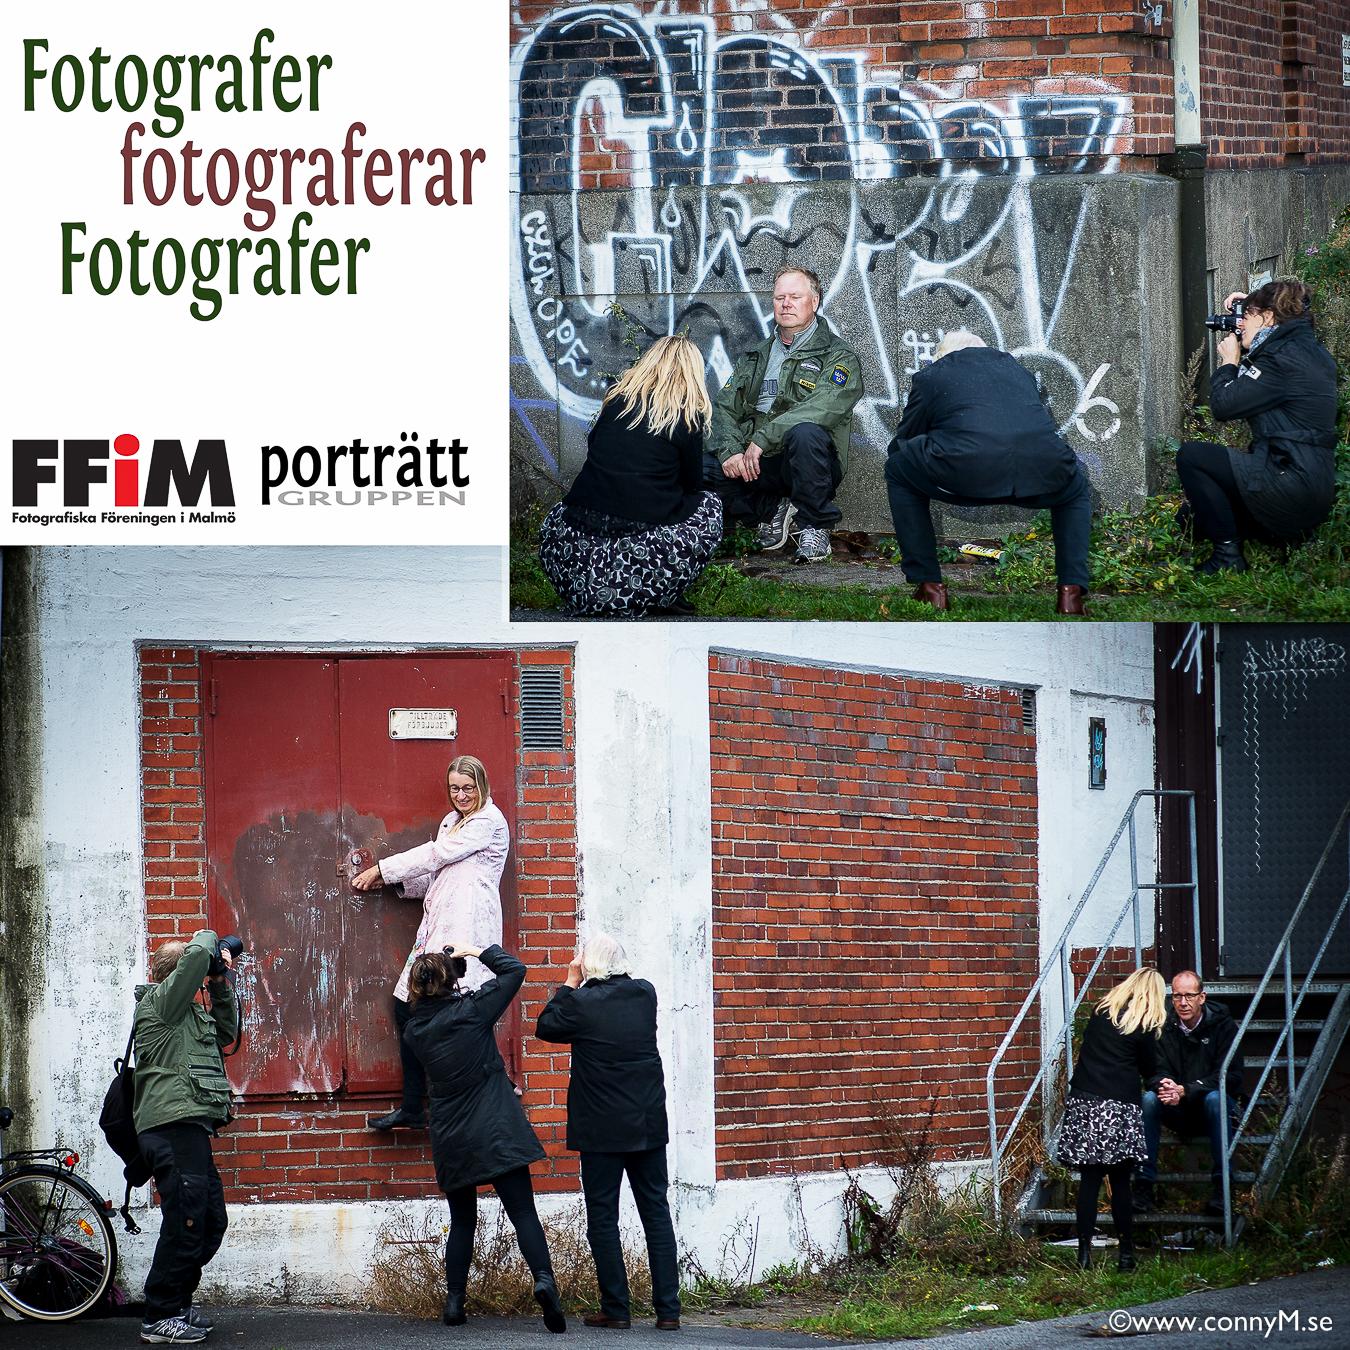 Fotografer_fotografera